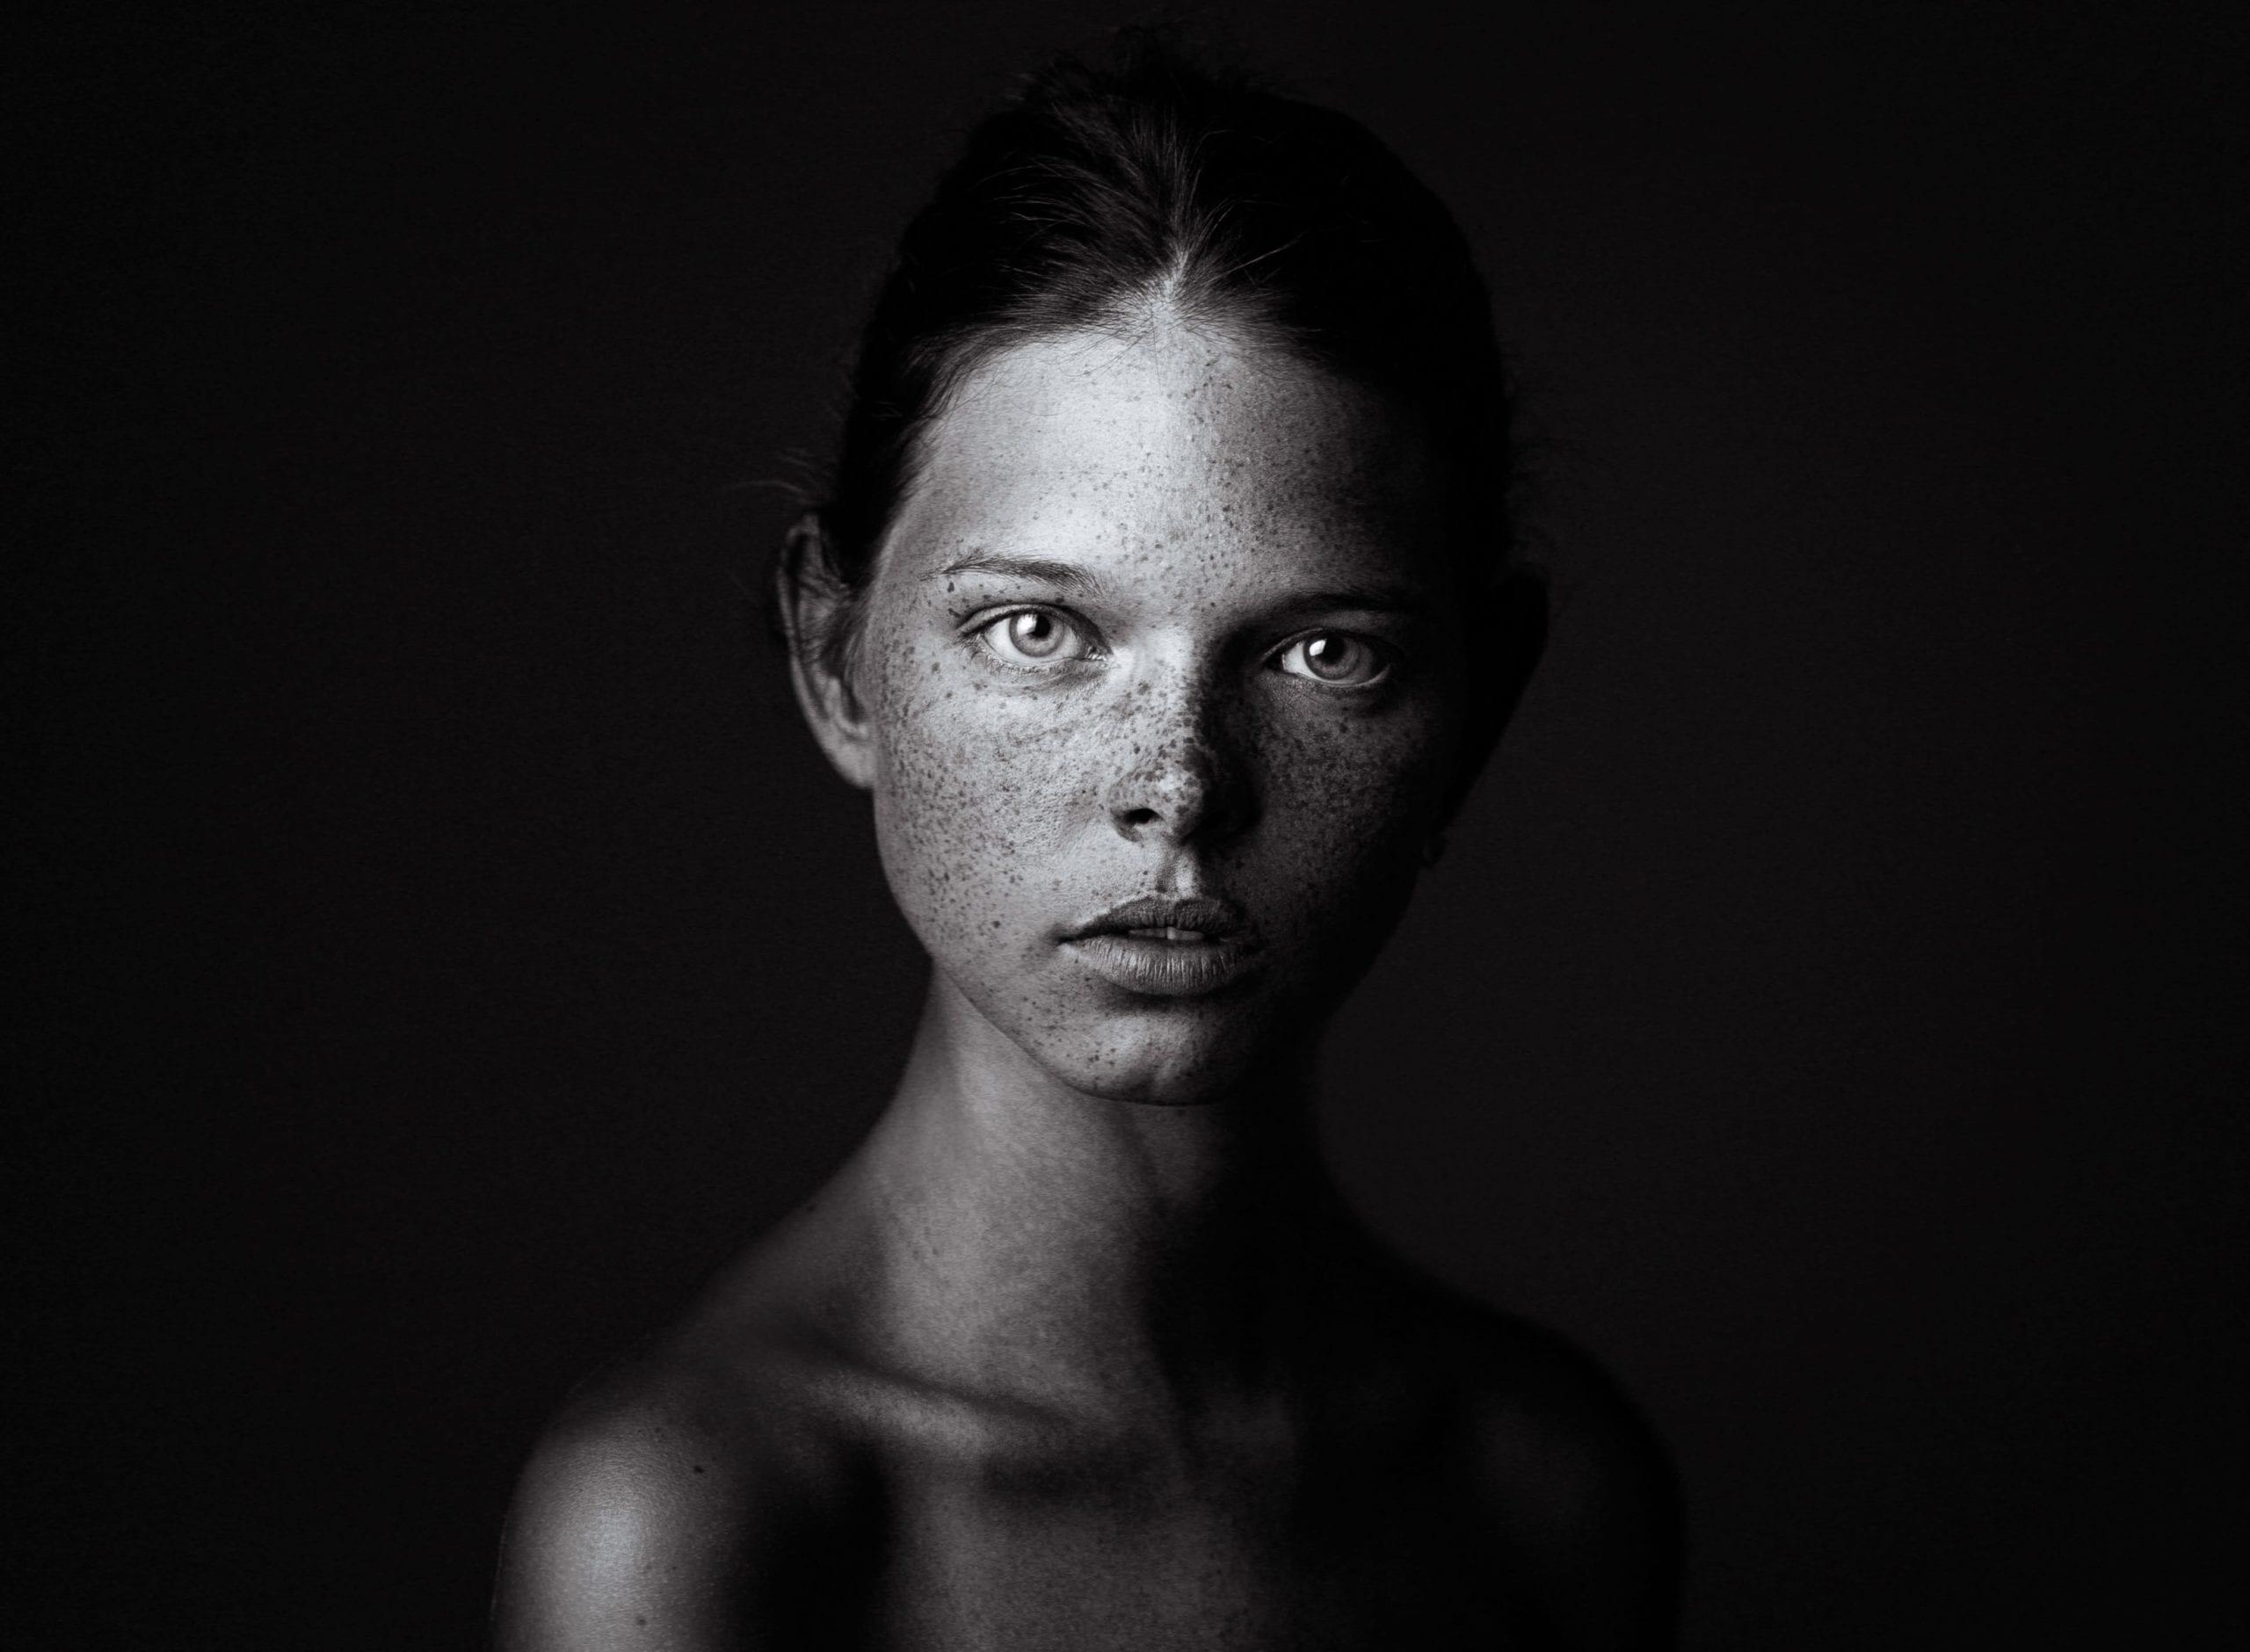 1st Place (Faces, B&W), 2014 – Rudoi Vladimirovich, Russian Federation